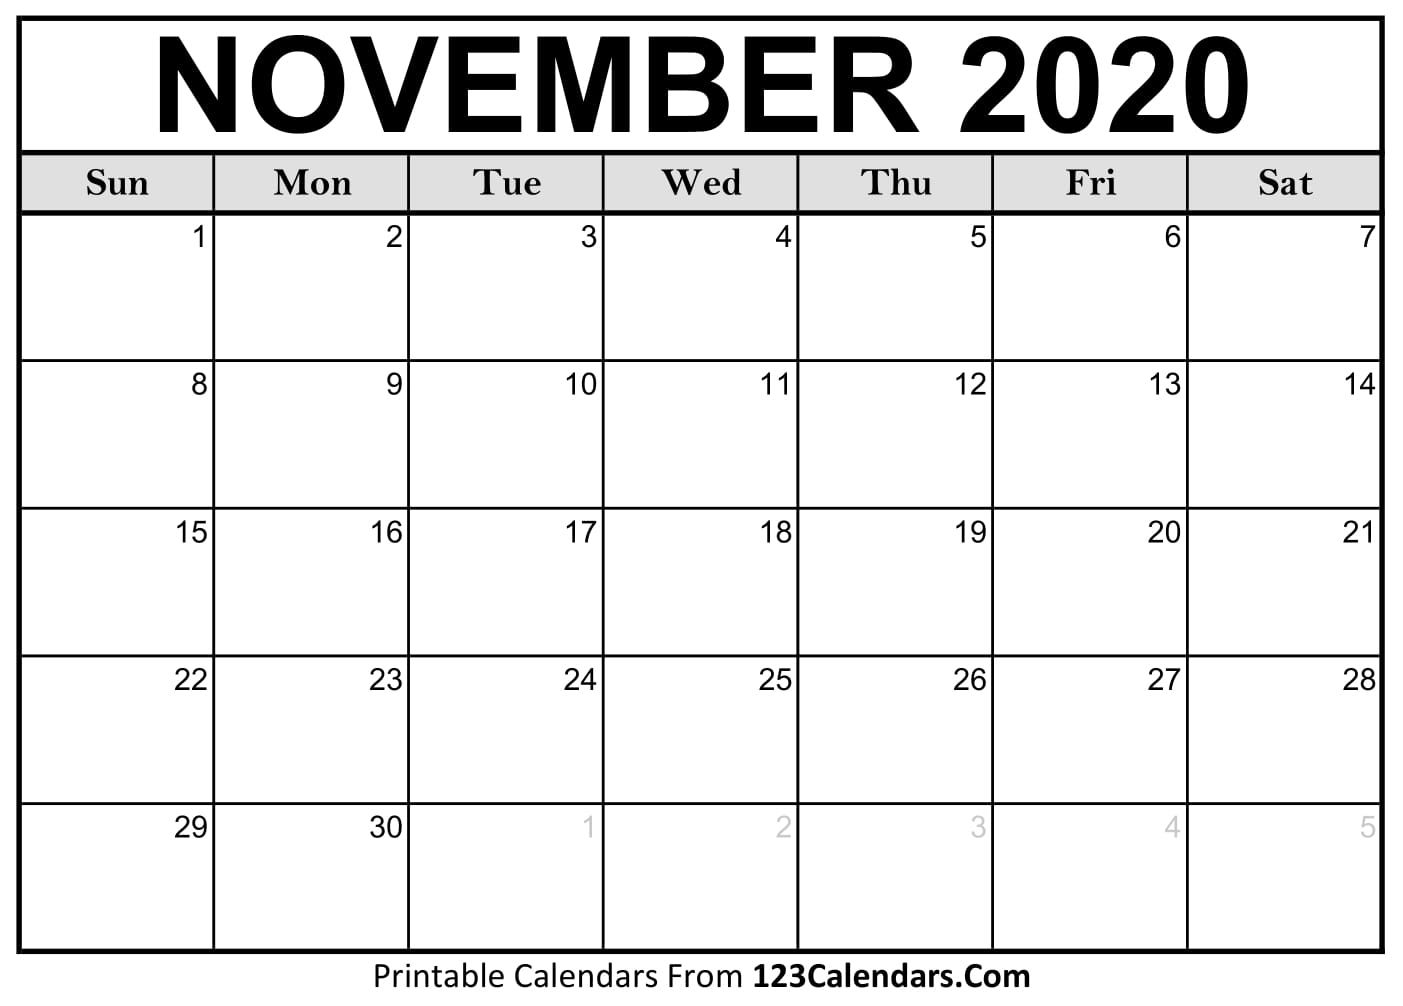 004 Unbelievable Printable Calendar Template November 2020 Idea  FreeFull